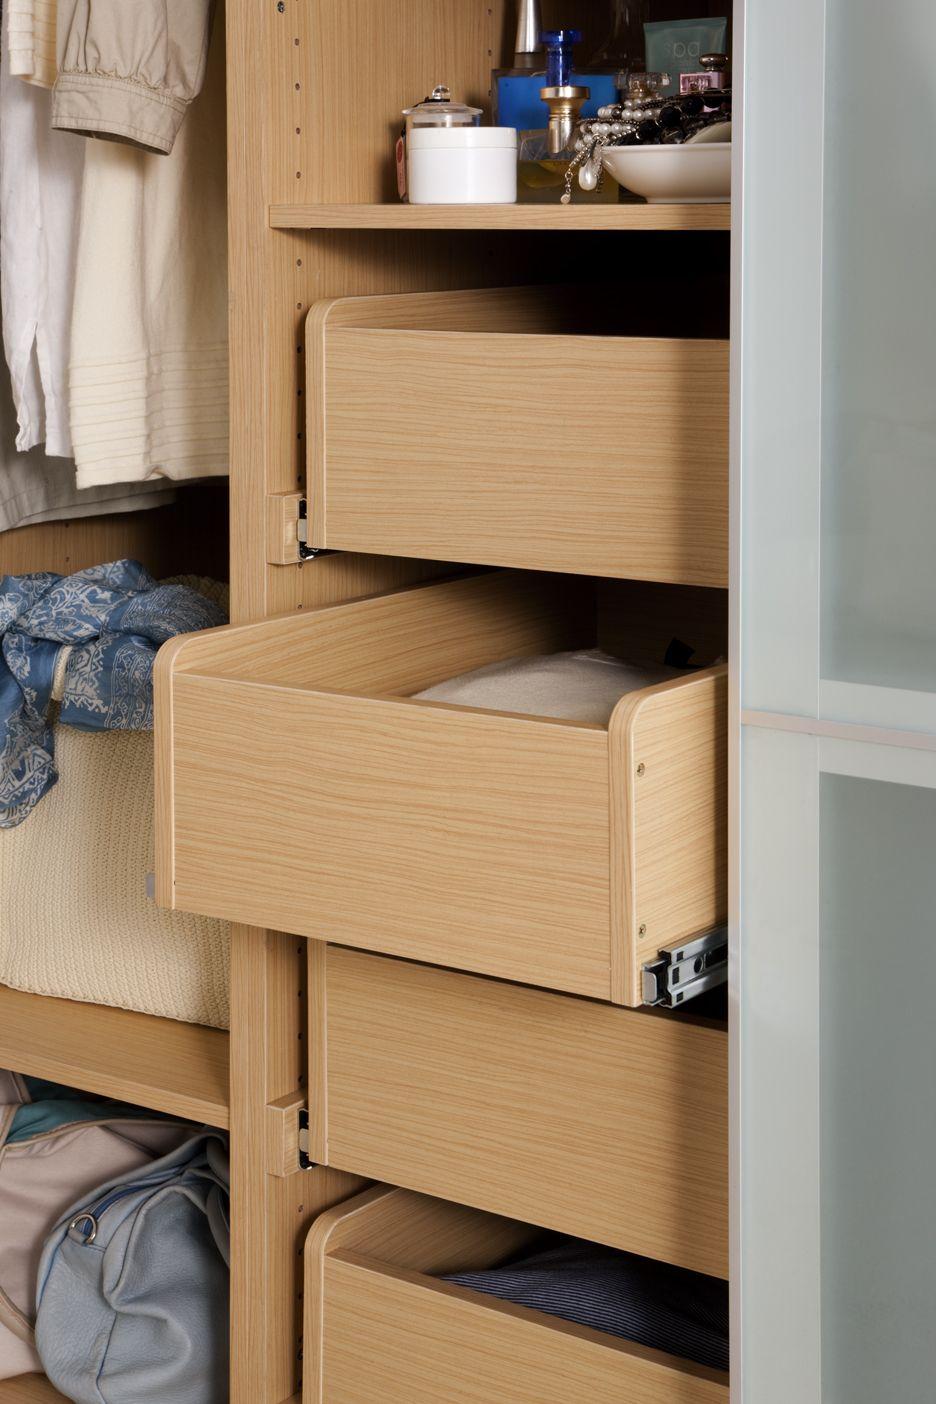 kaboodle 450mm light oak wardrobe drawer bunnings warehouse oak wardrobe closet clothes on kaboodle kitchen bunnings drawers id=26166